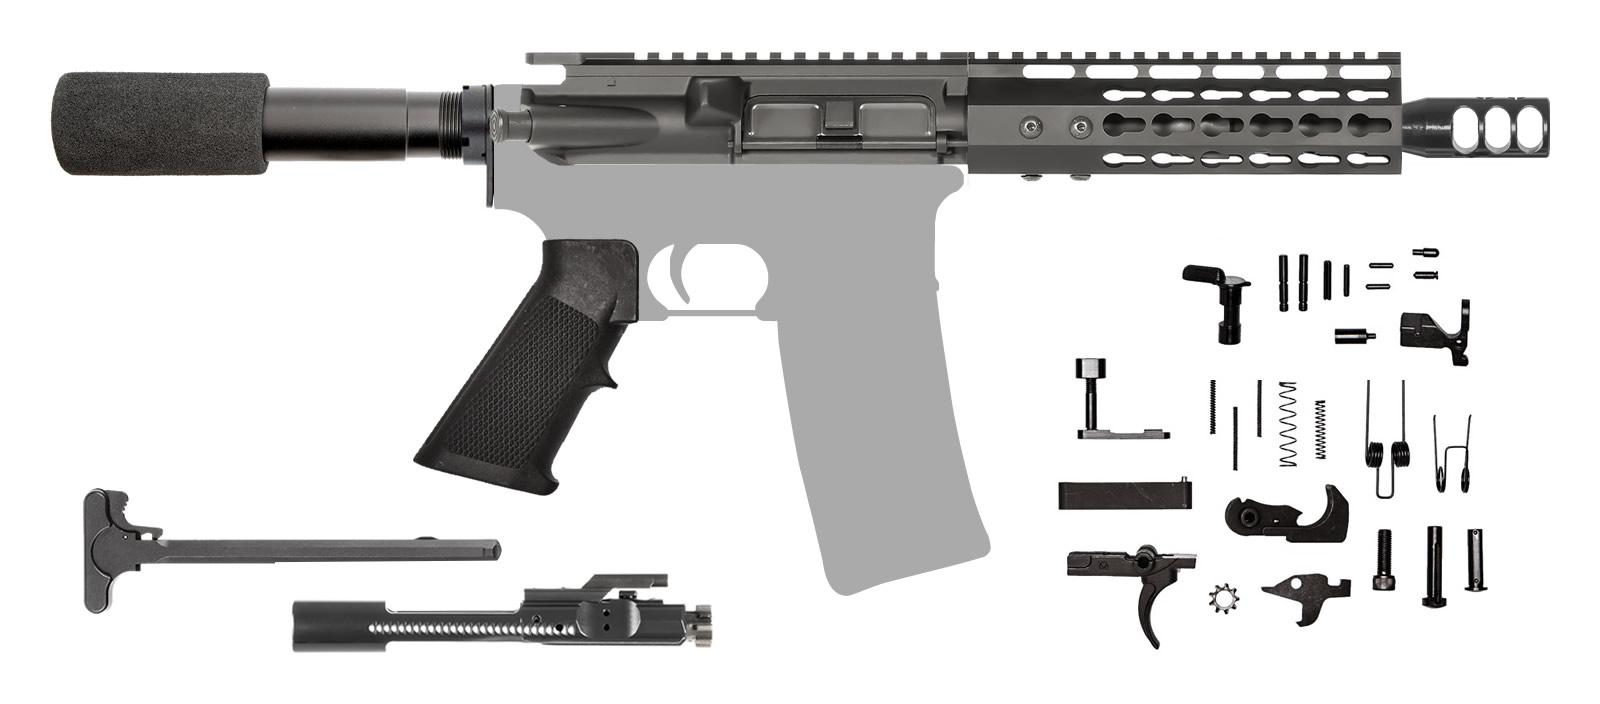 AR-15 Pistol Kit - 7 5